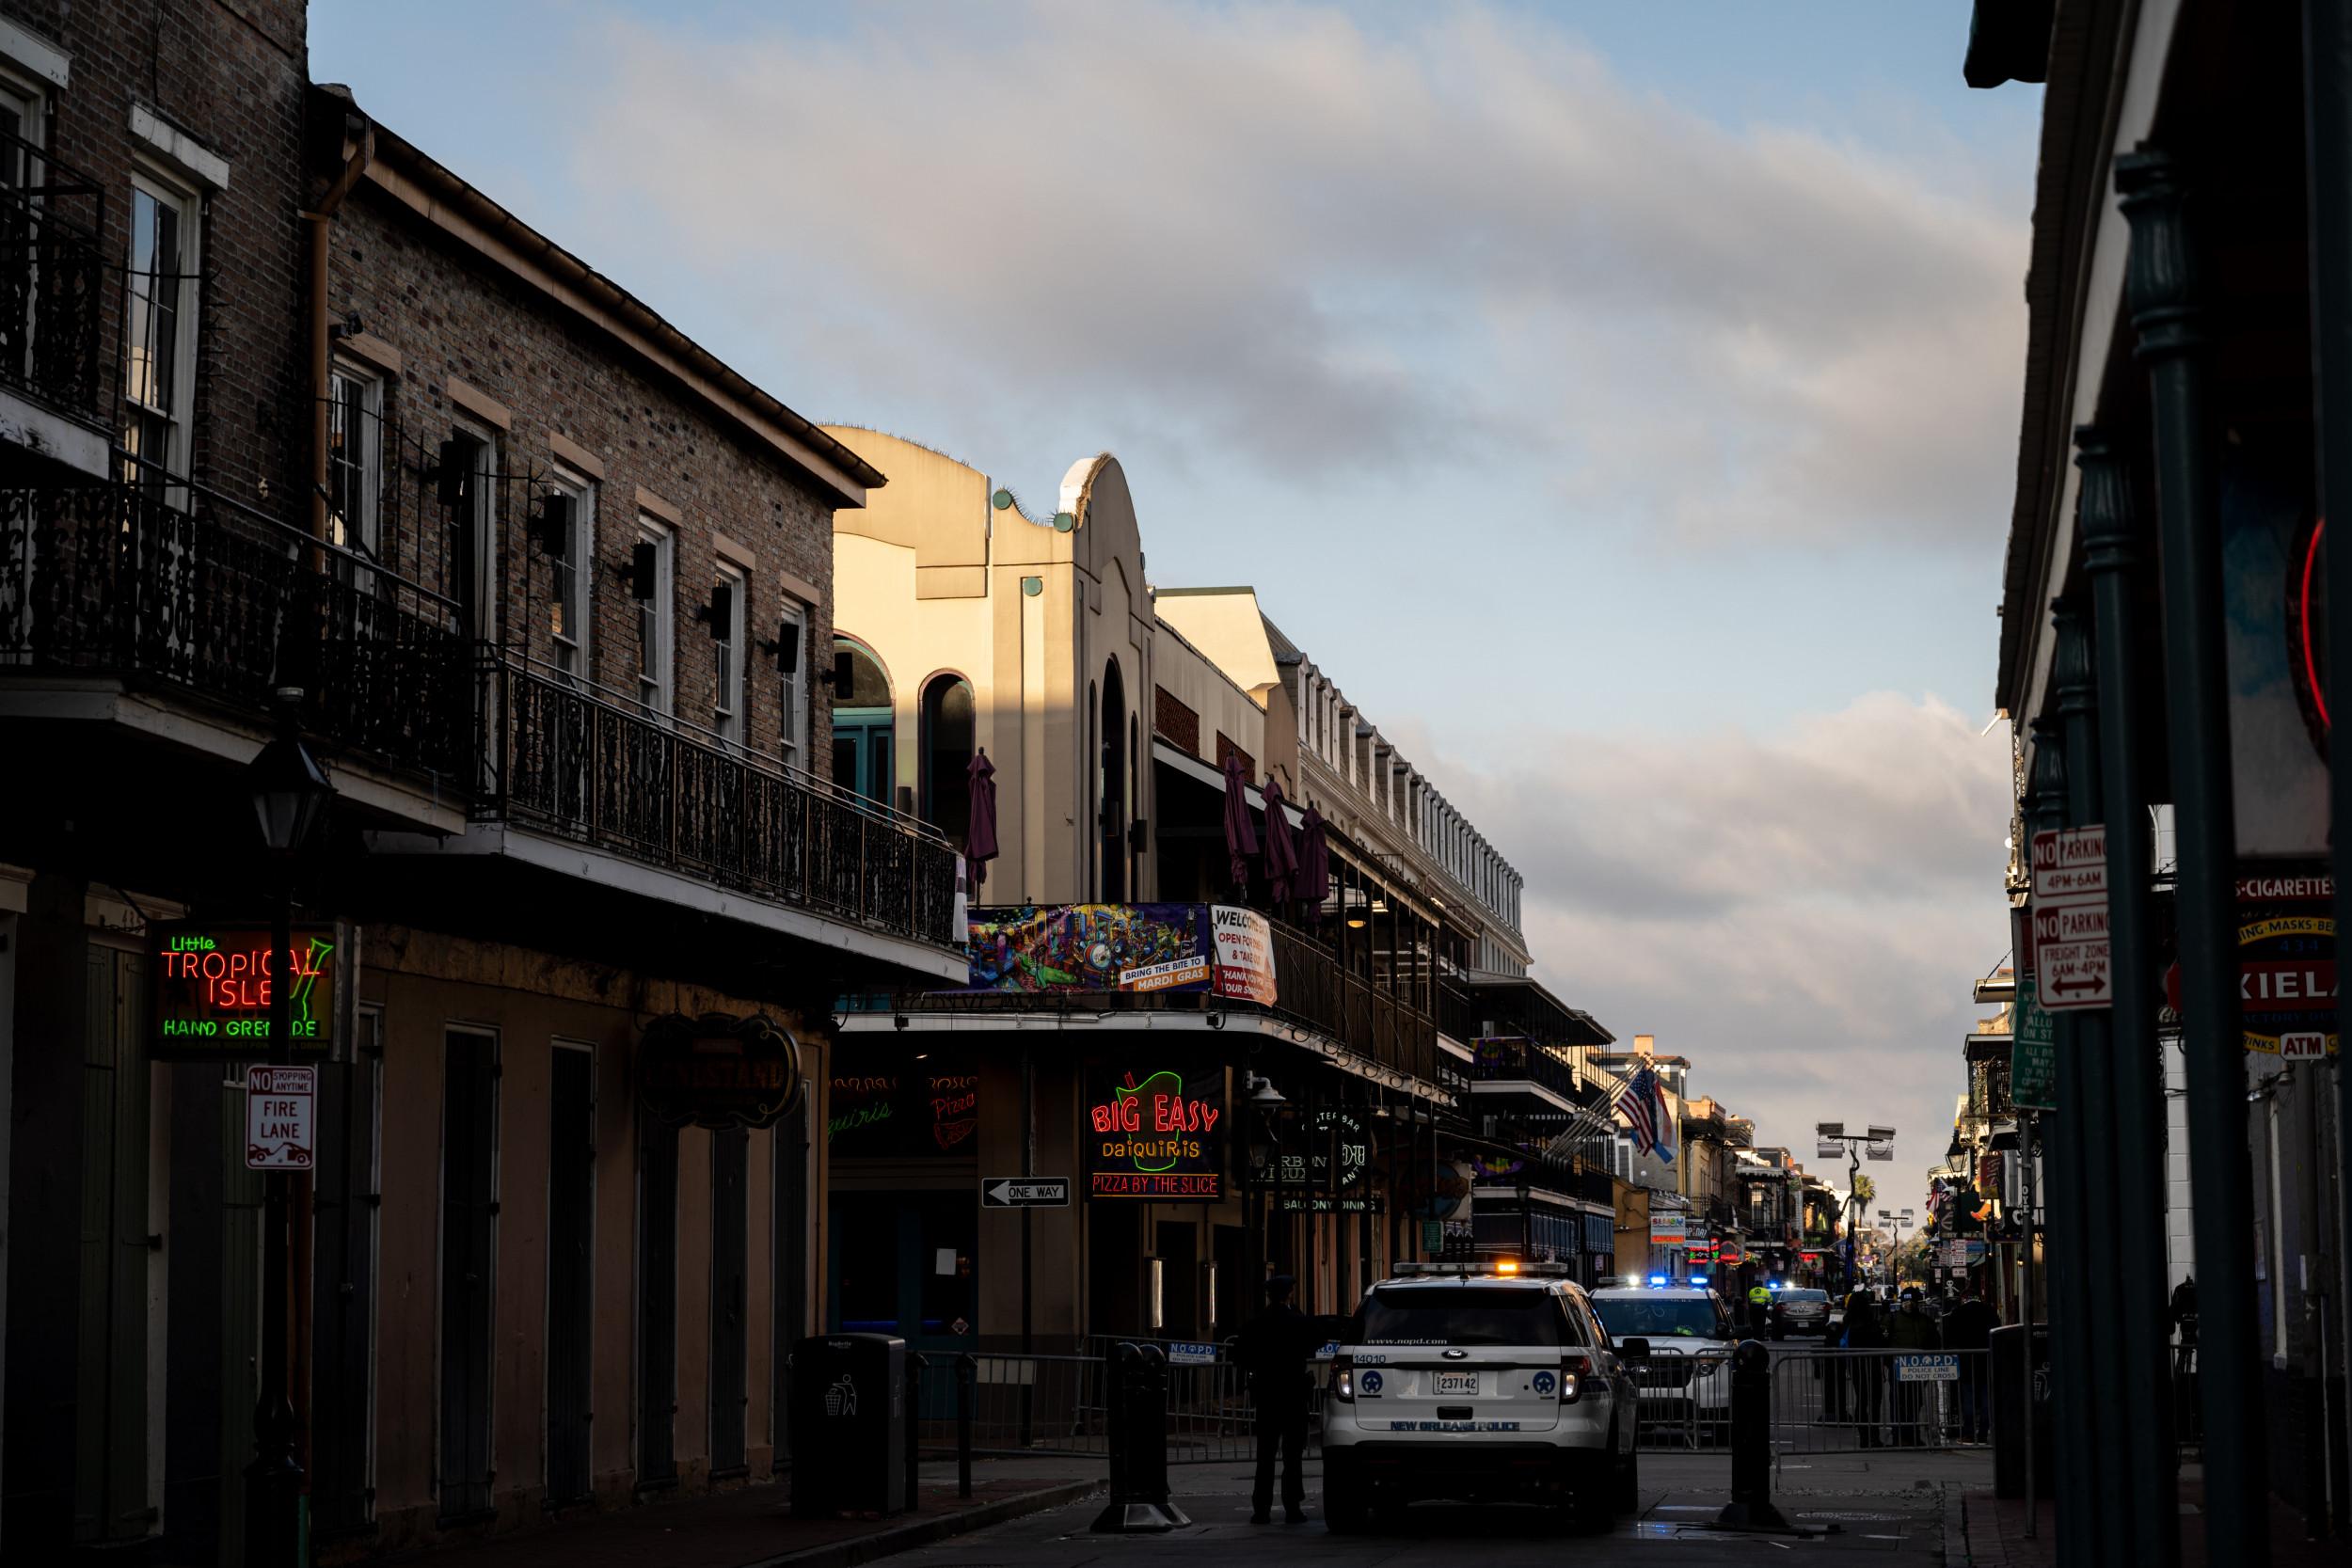 Video Captures Start of Bourbon Street Shooting